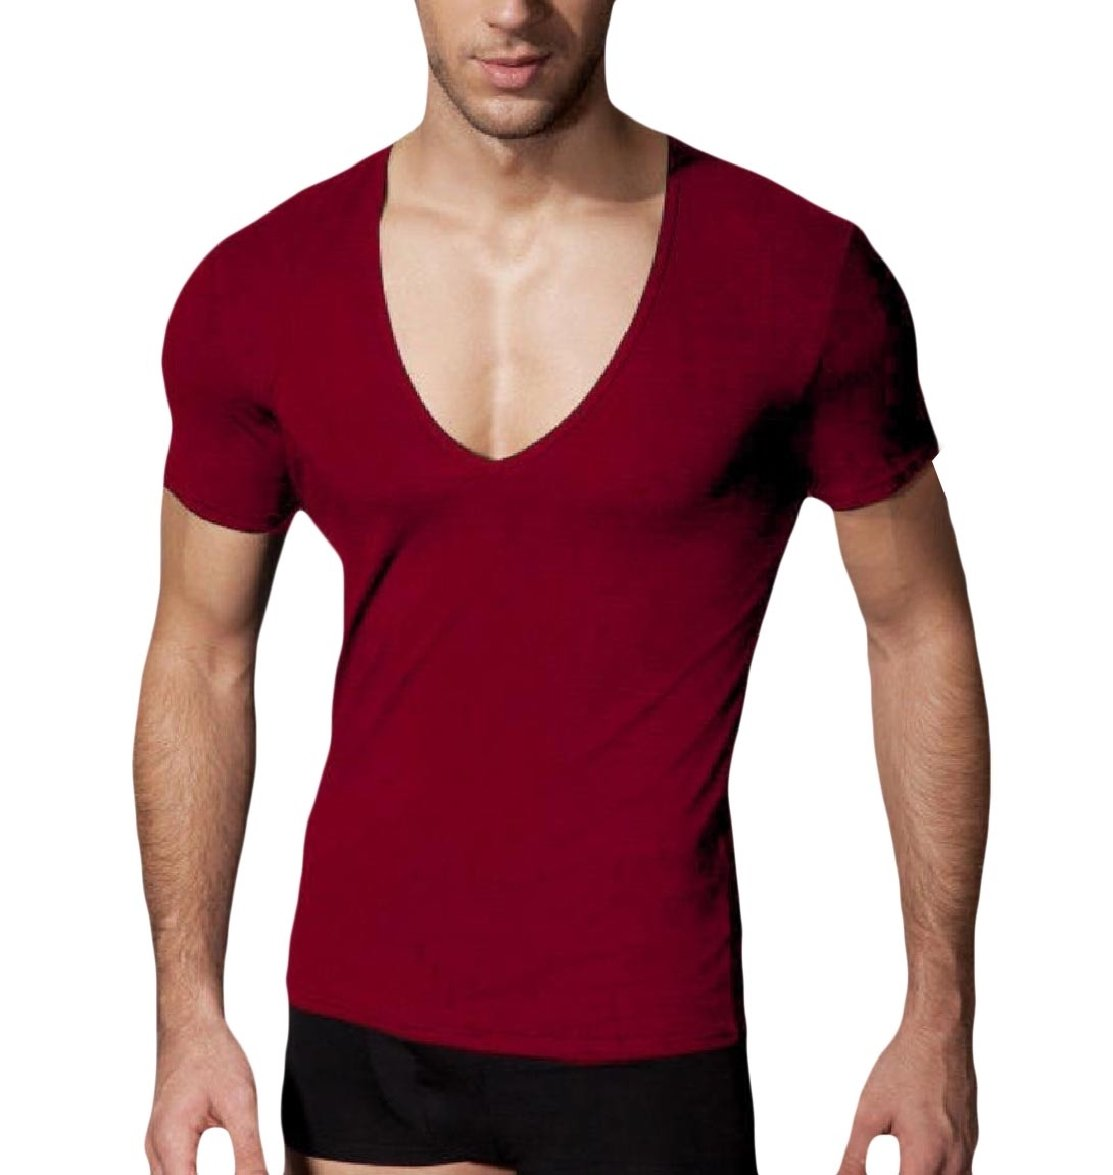 Fseason-Men Short-Sleeve Stretch V-Neck Solid Color Modal Sport T-Shirt Top Wine Red XS